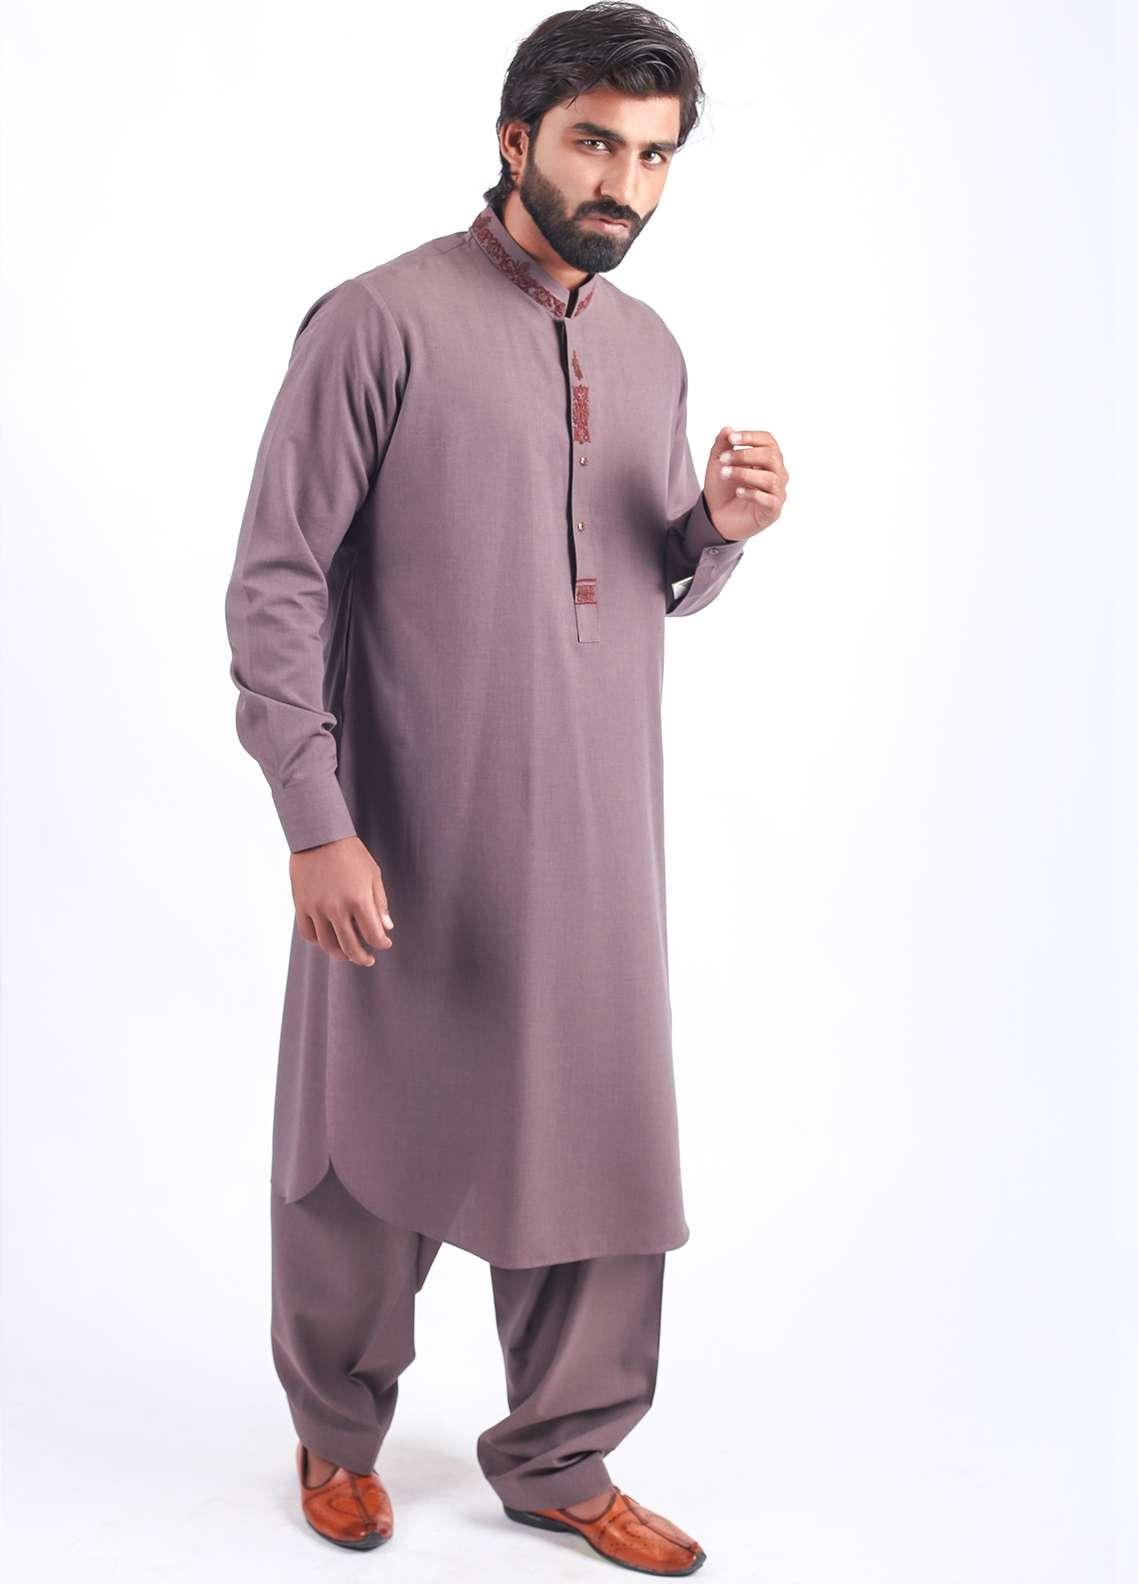 Aizaz Zafar Wash N Wear Embroidered Shalwar Kameez for Men - Mouve AZ18M 015